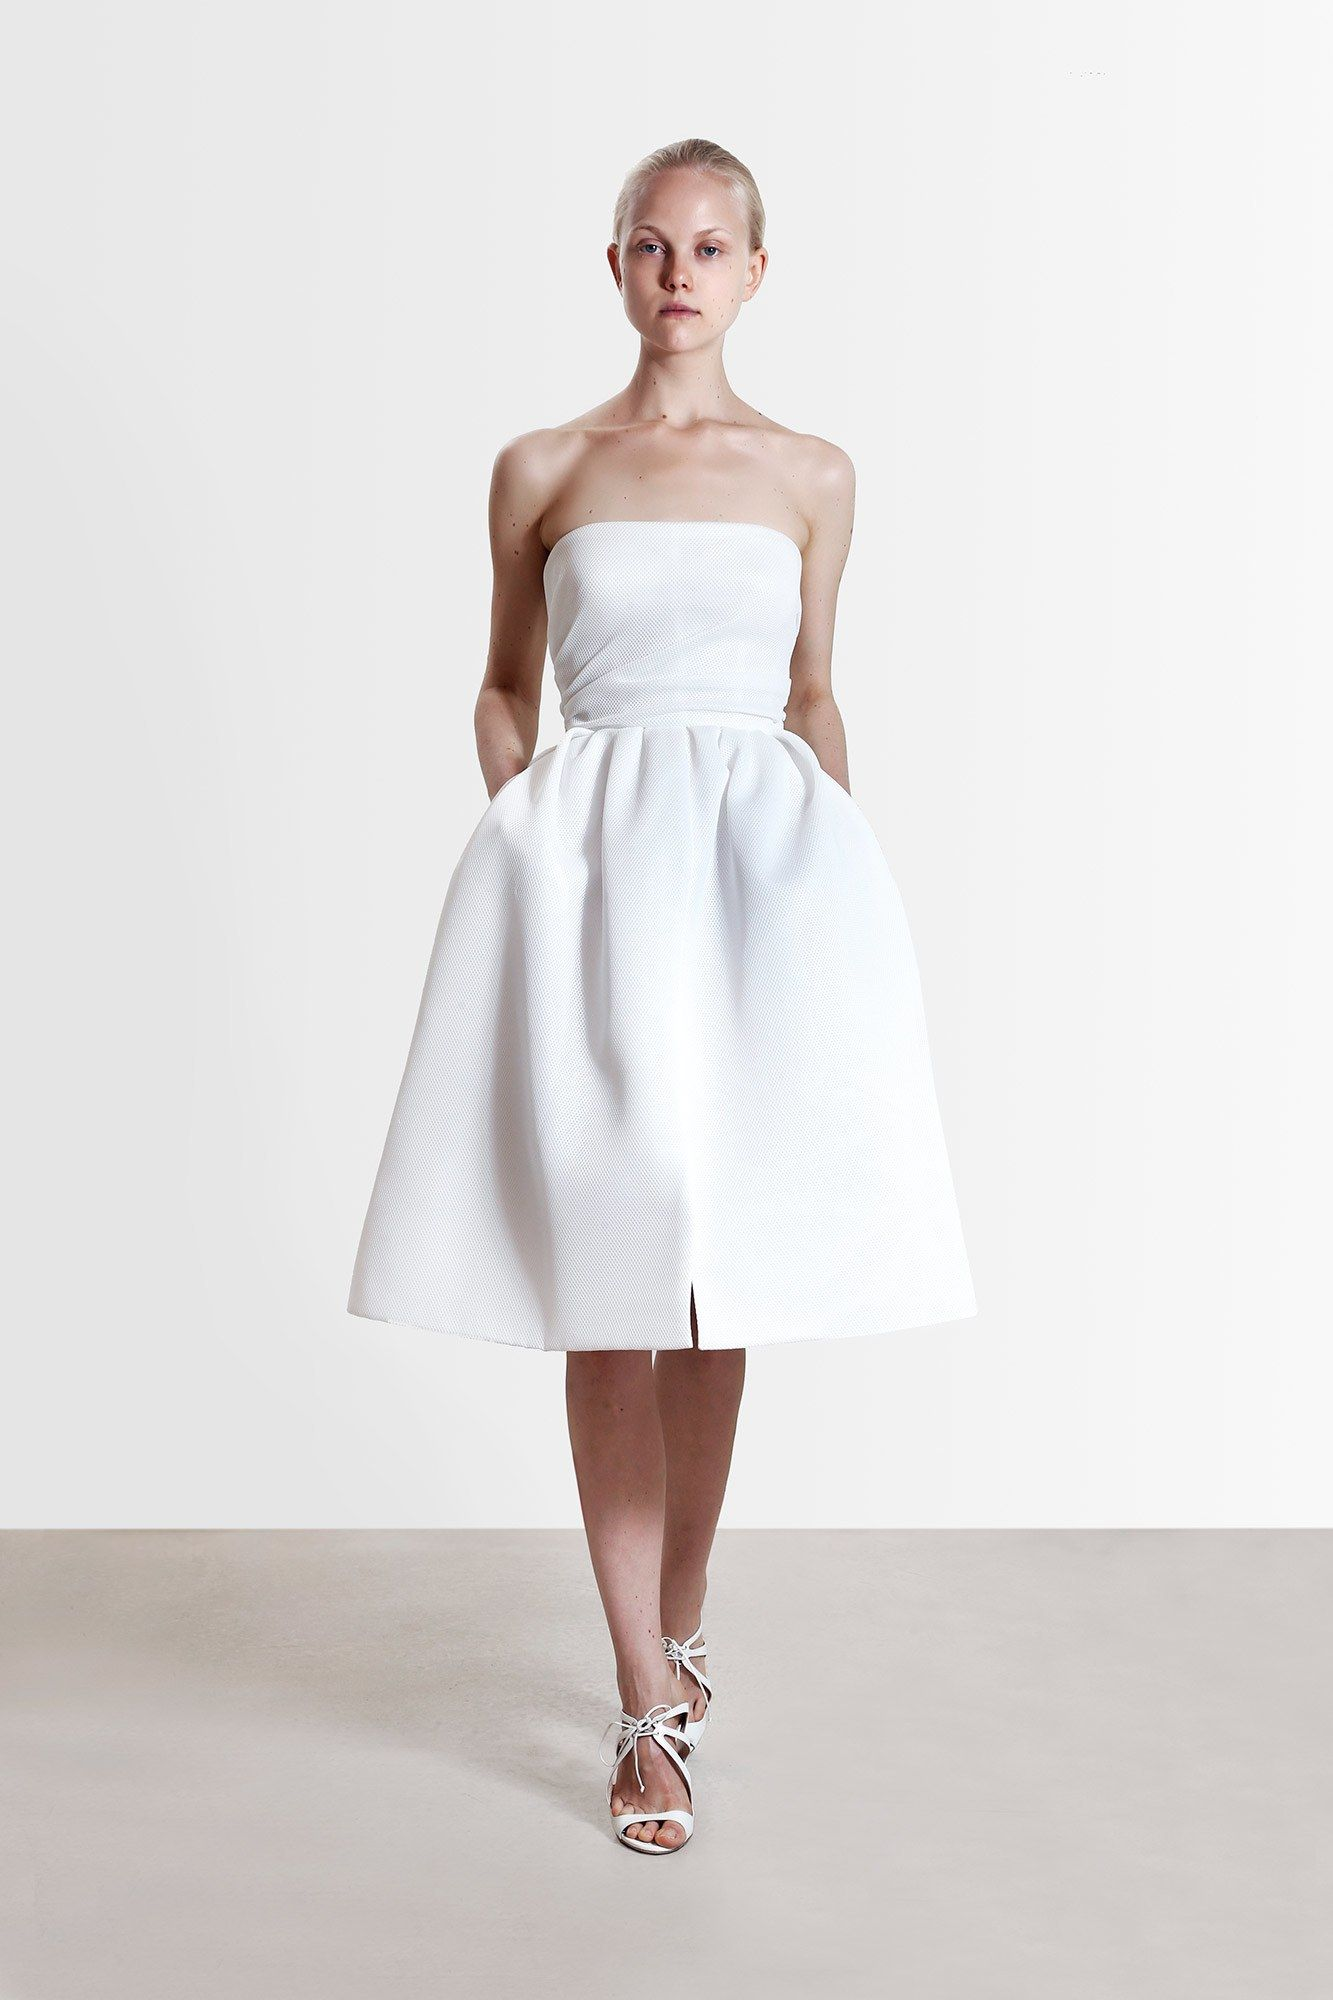 Zdroj fotky:http://www.vogue.com/fashion-shows/resort-2017/reem-acra/slideshow/collection#2